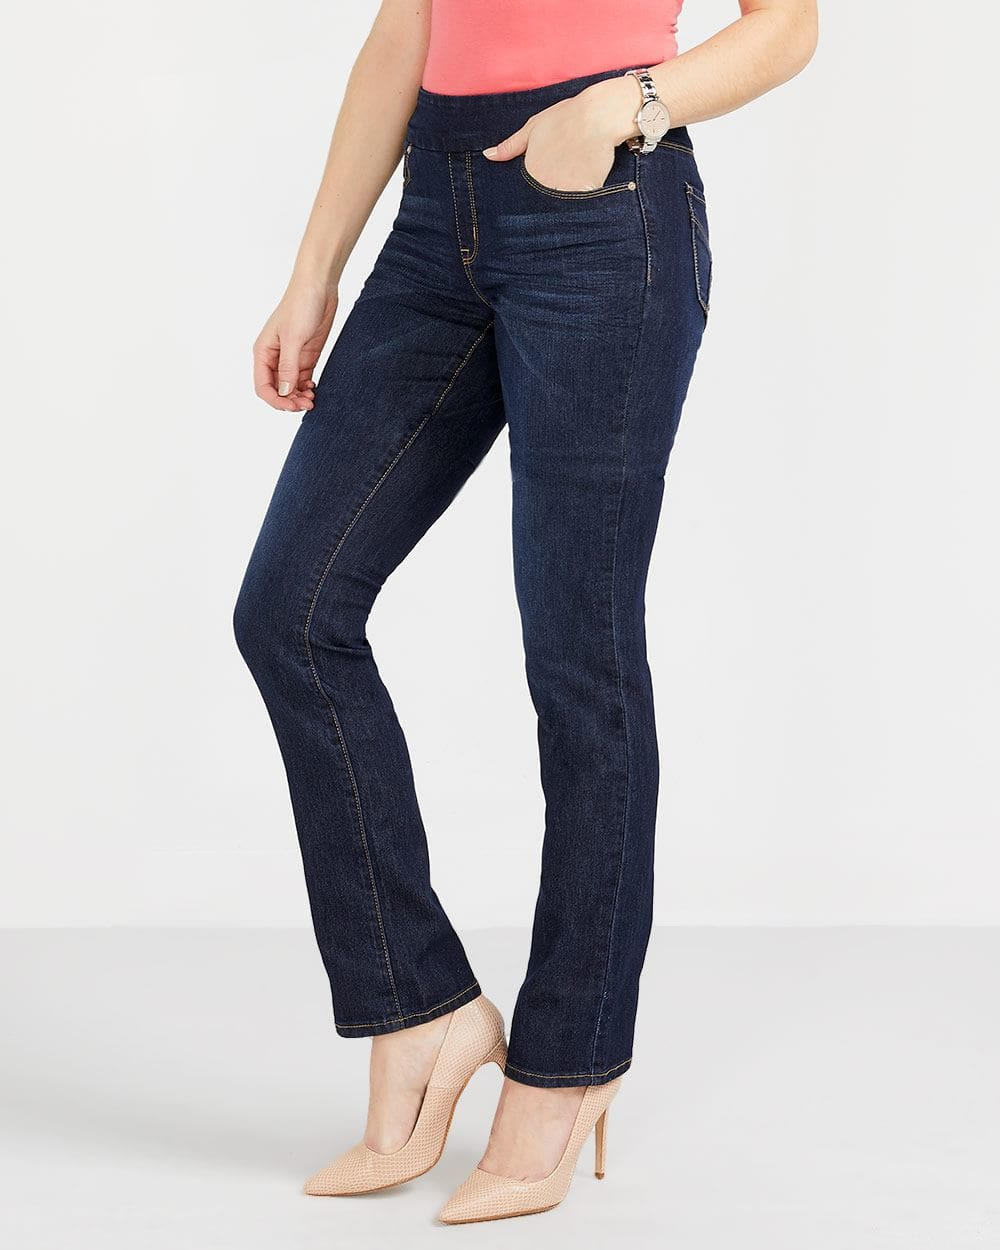 The Tall Original Comfort Straight Leg Jeans